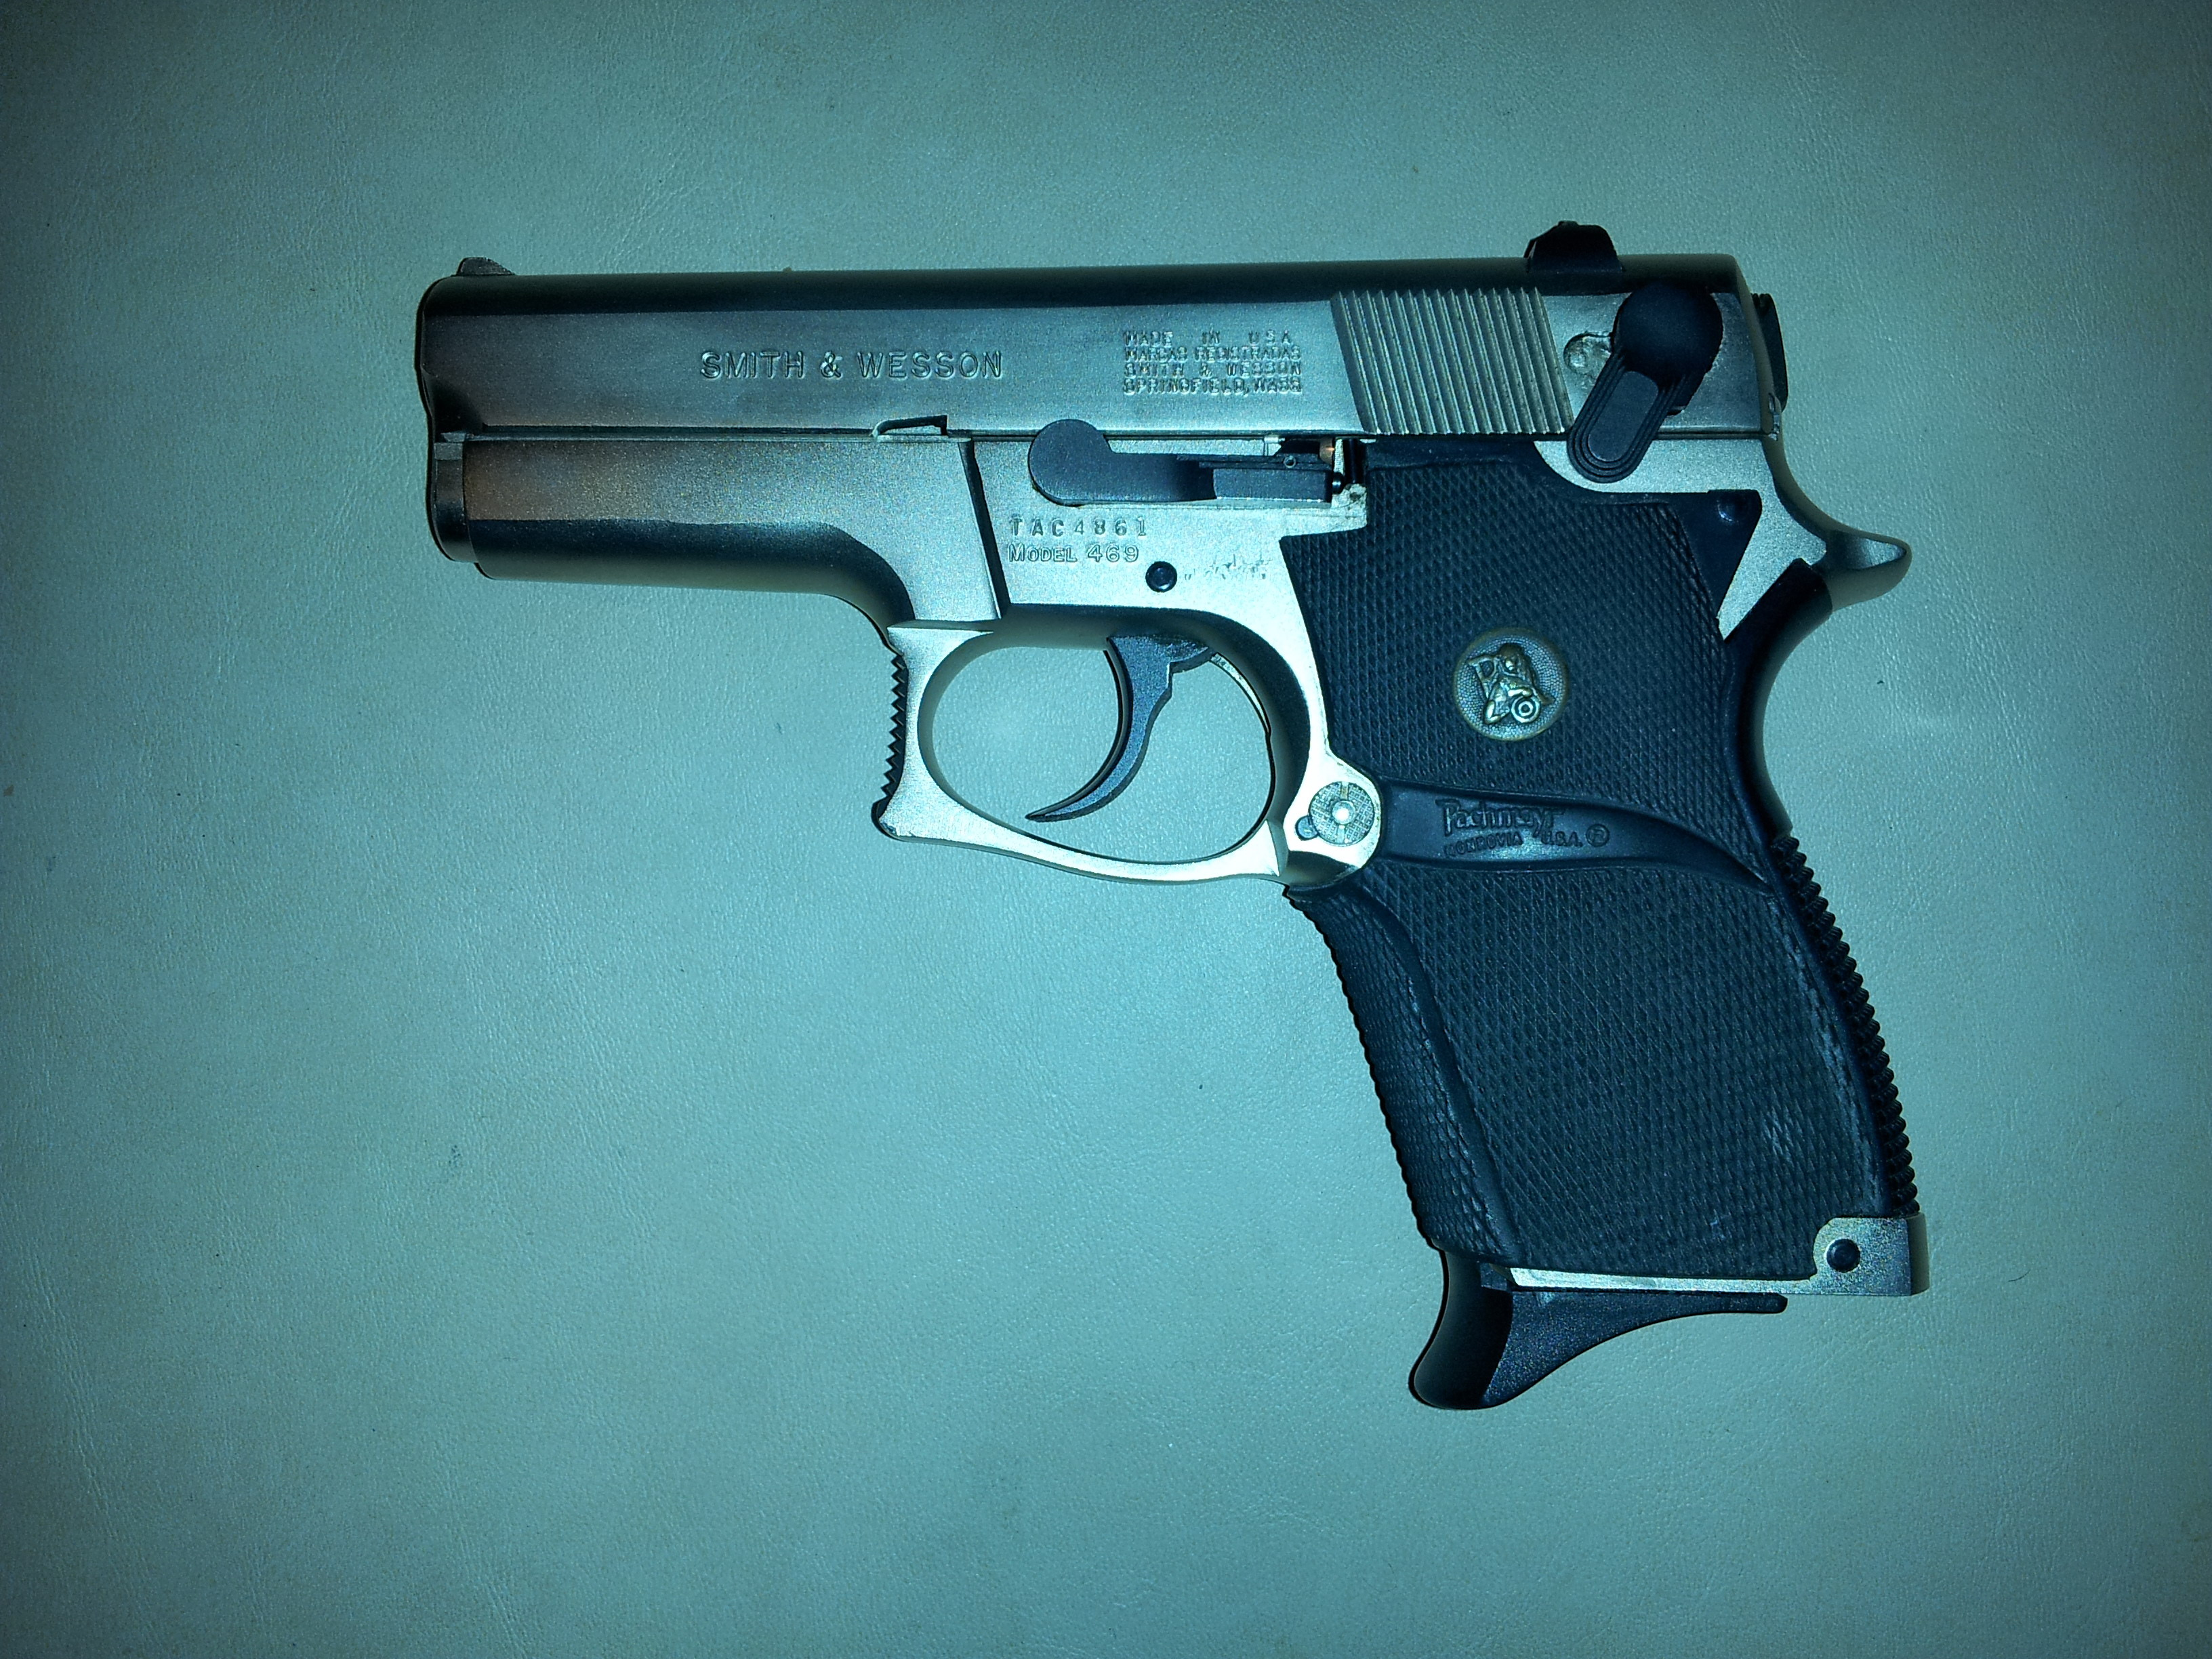 Smith & Wesson Model 469 - Wikipedia